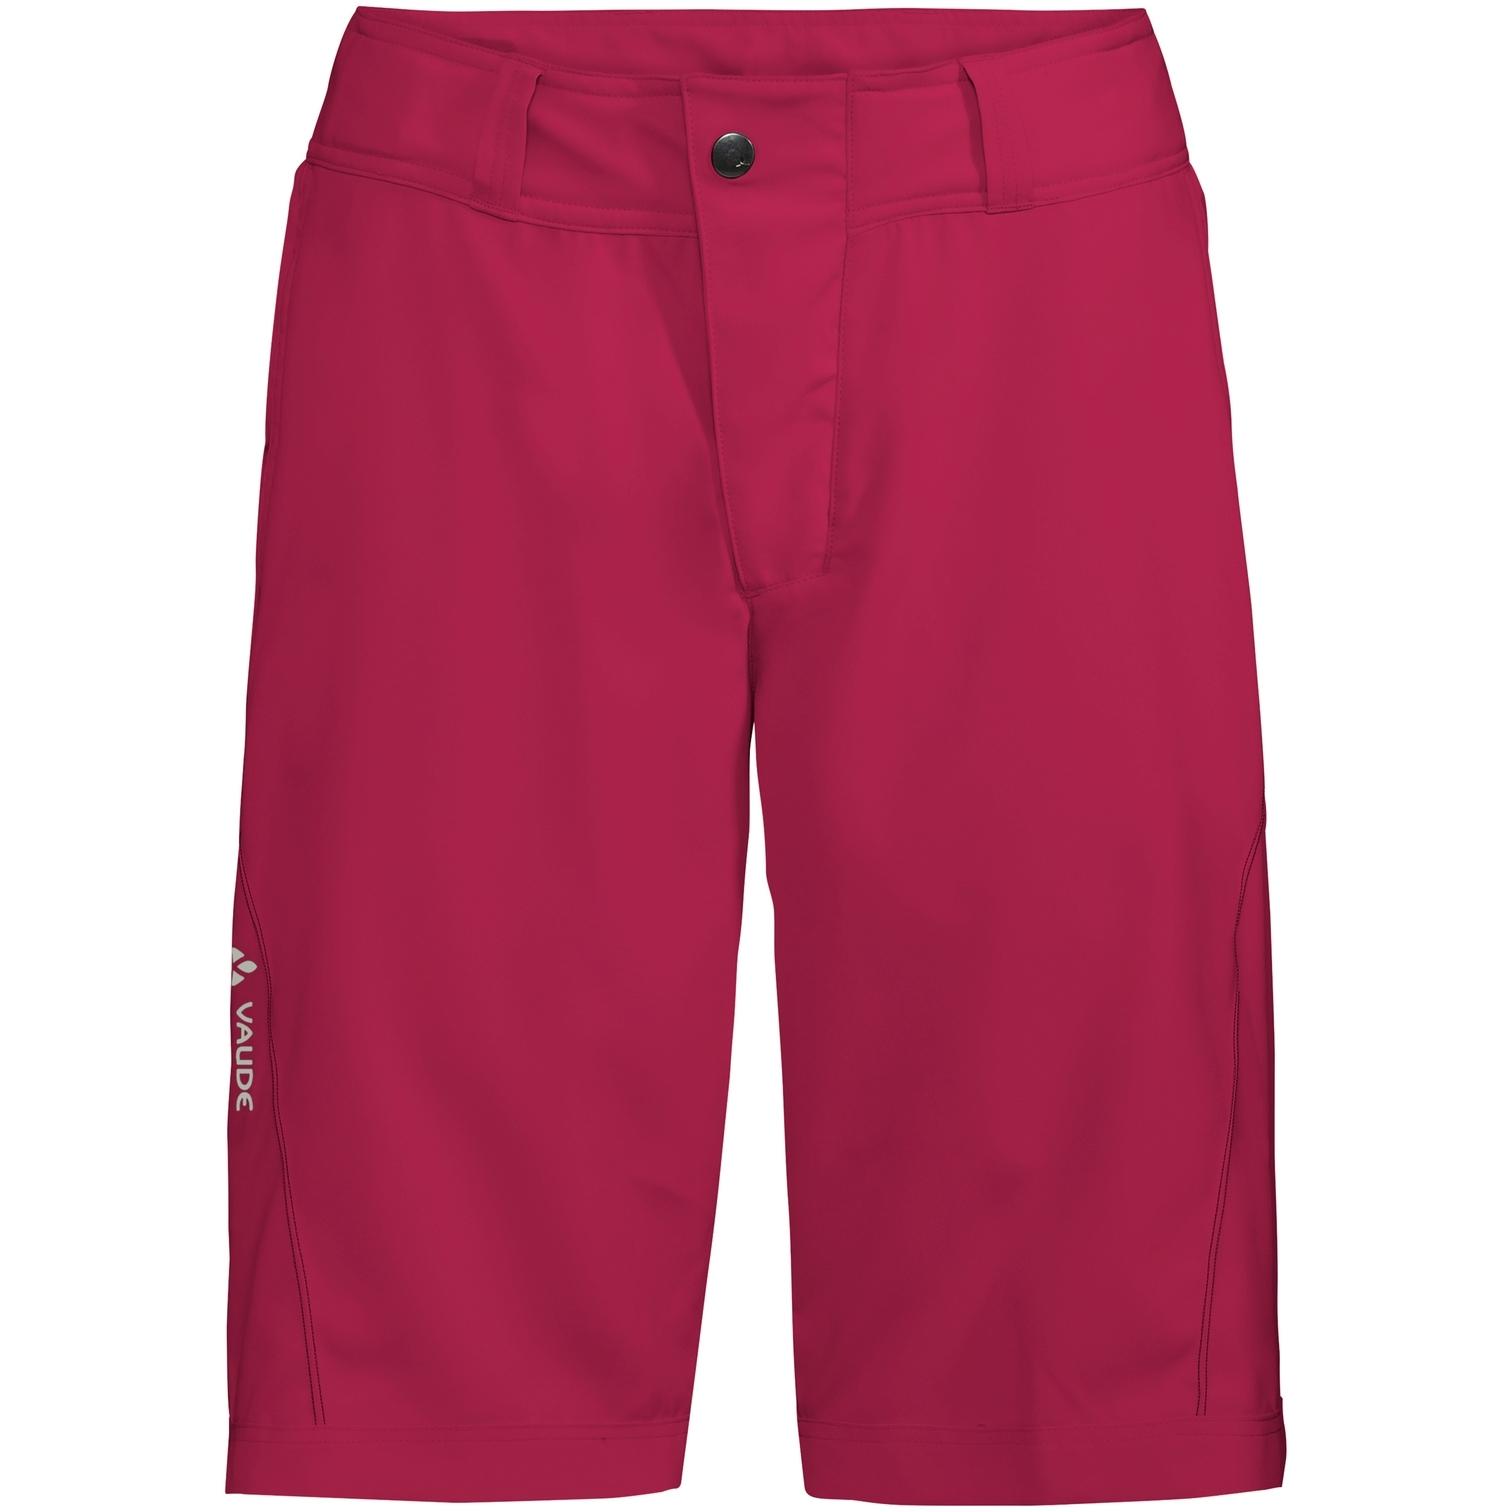 Vaude Ledro Damen Shorts - crimson red